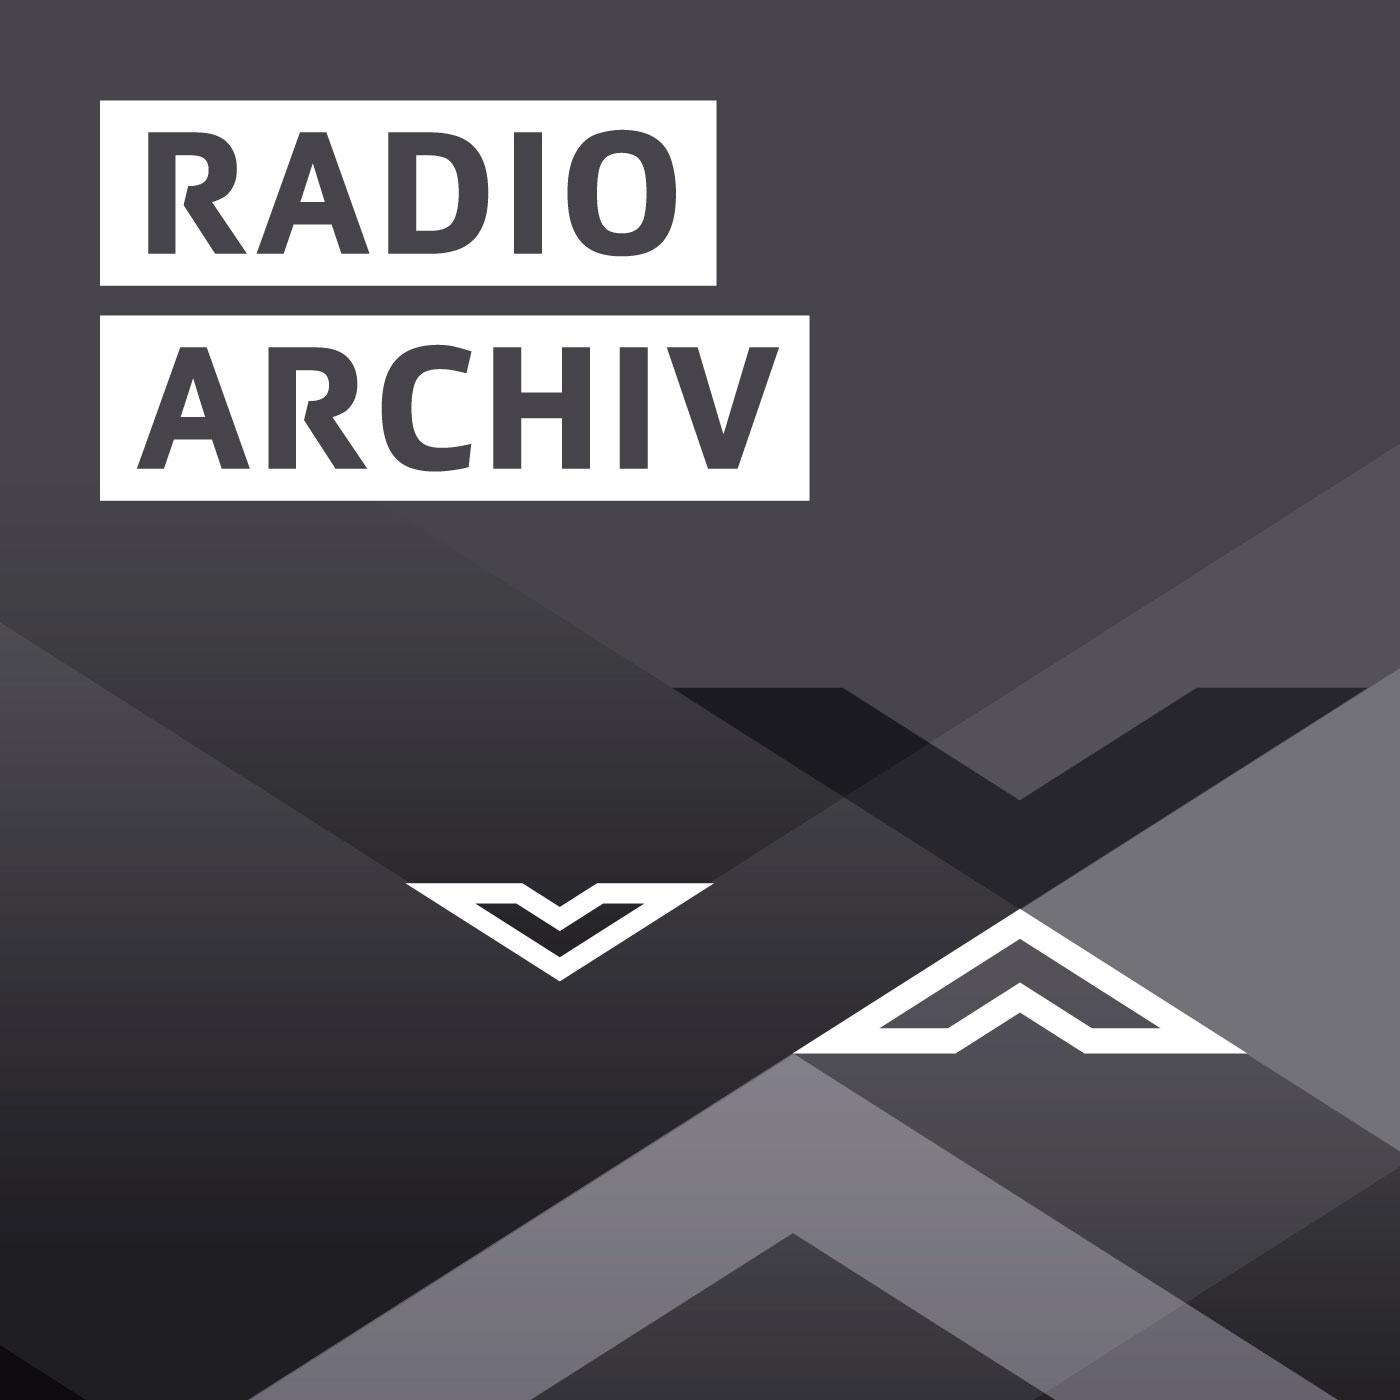 Radioarchiv